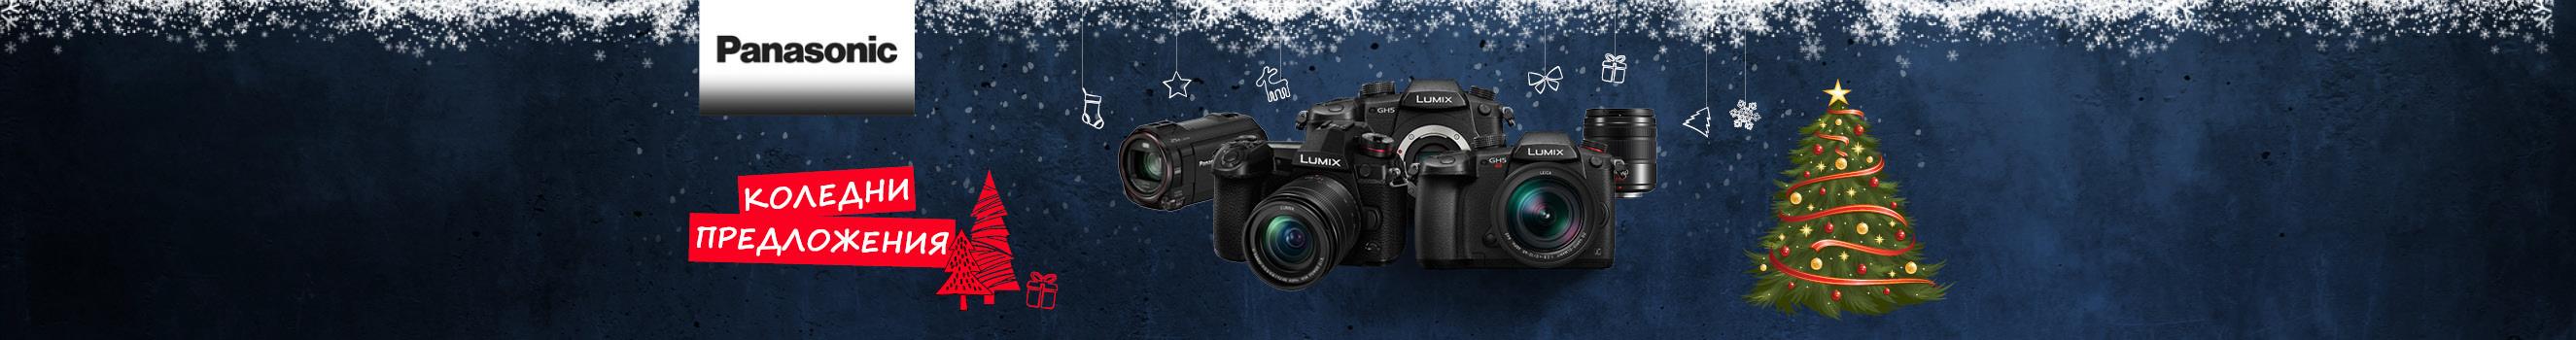 Фотоапарати Panasonic, обективи, видеокамери, аксесоари на празнични промоционални цени в магазини ФотоСинтезис